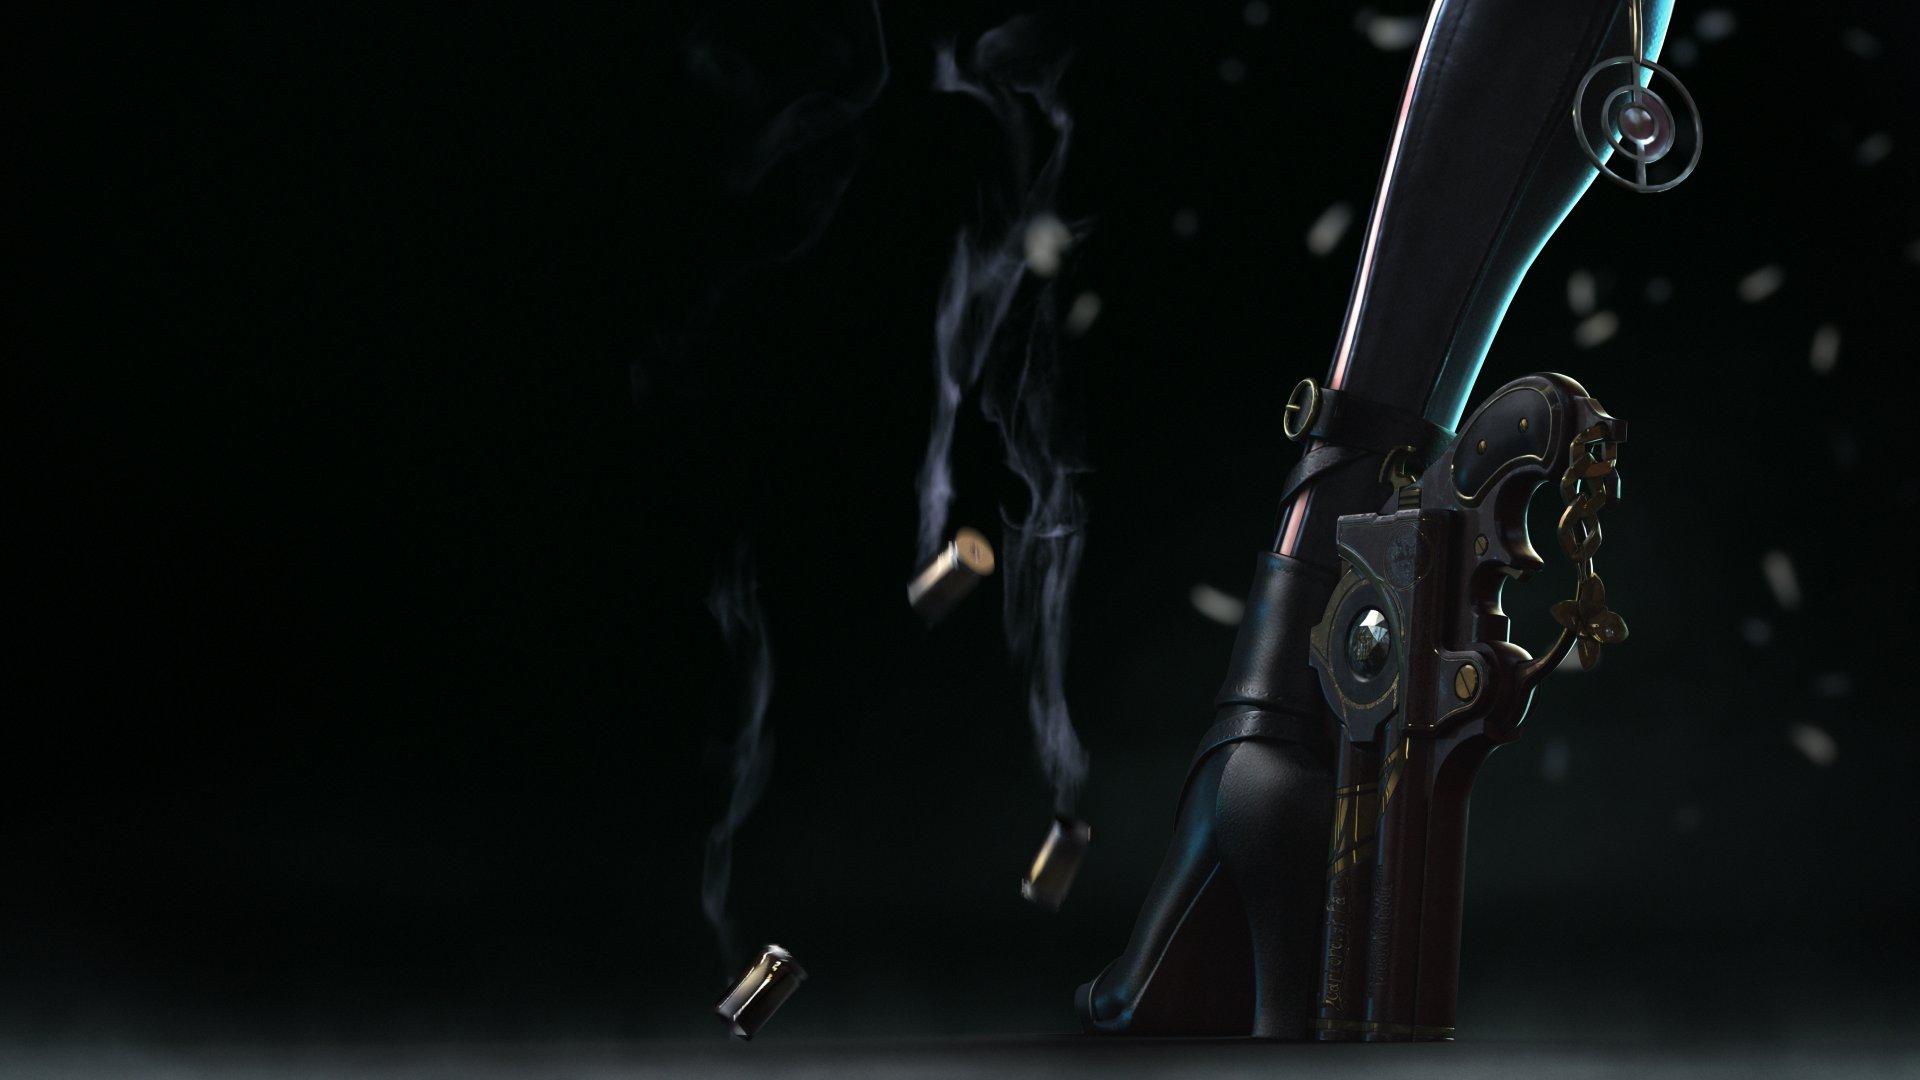 Heel Gun And Smoking Bullets